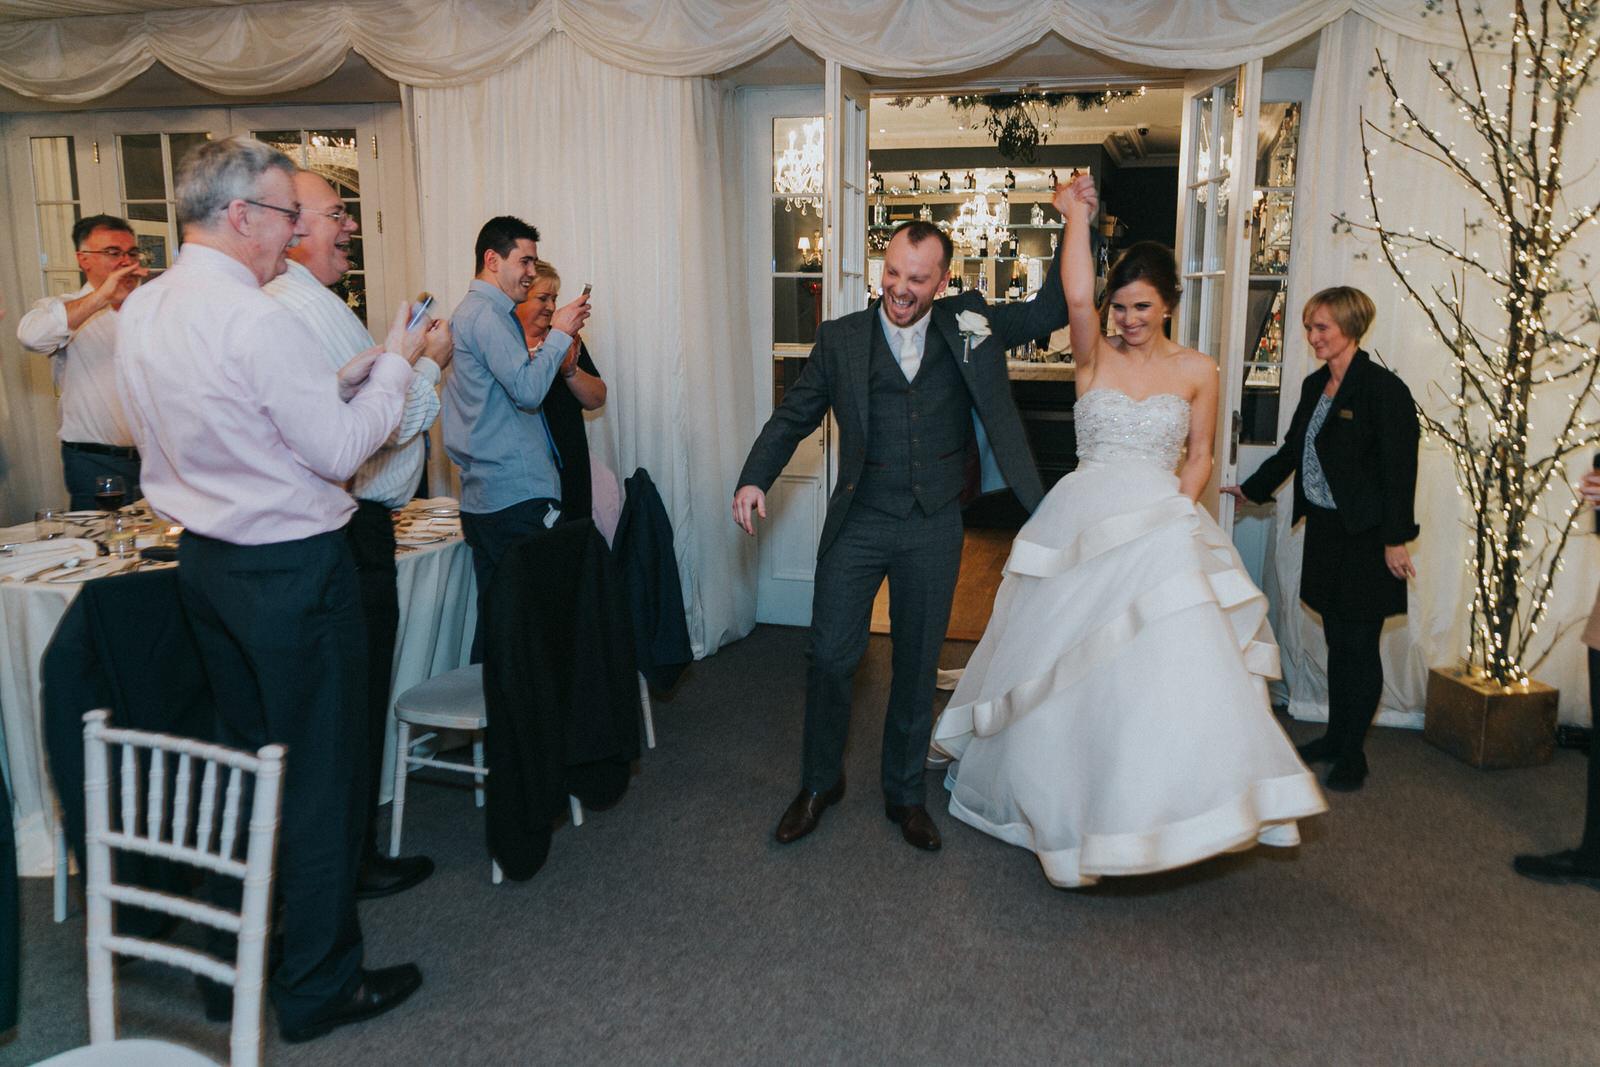 Clonabreany_wedding-photographer_roger_kenny_ireland_105.jpg